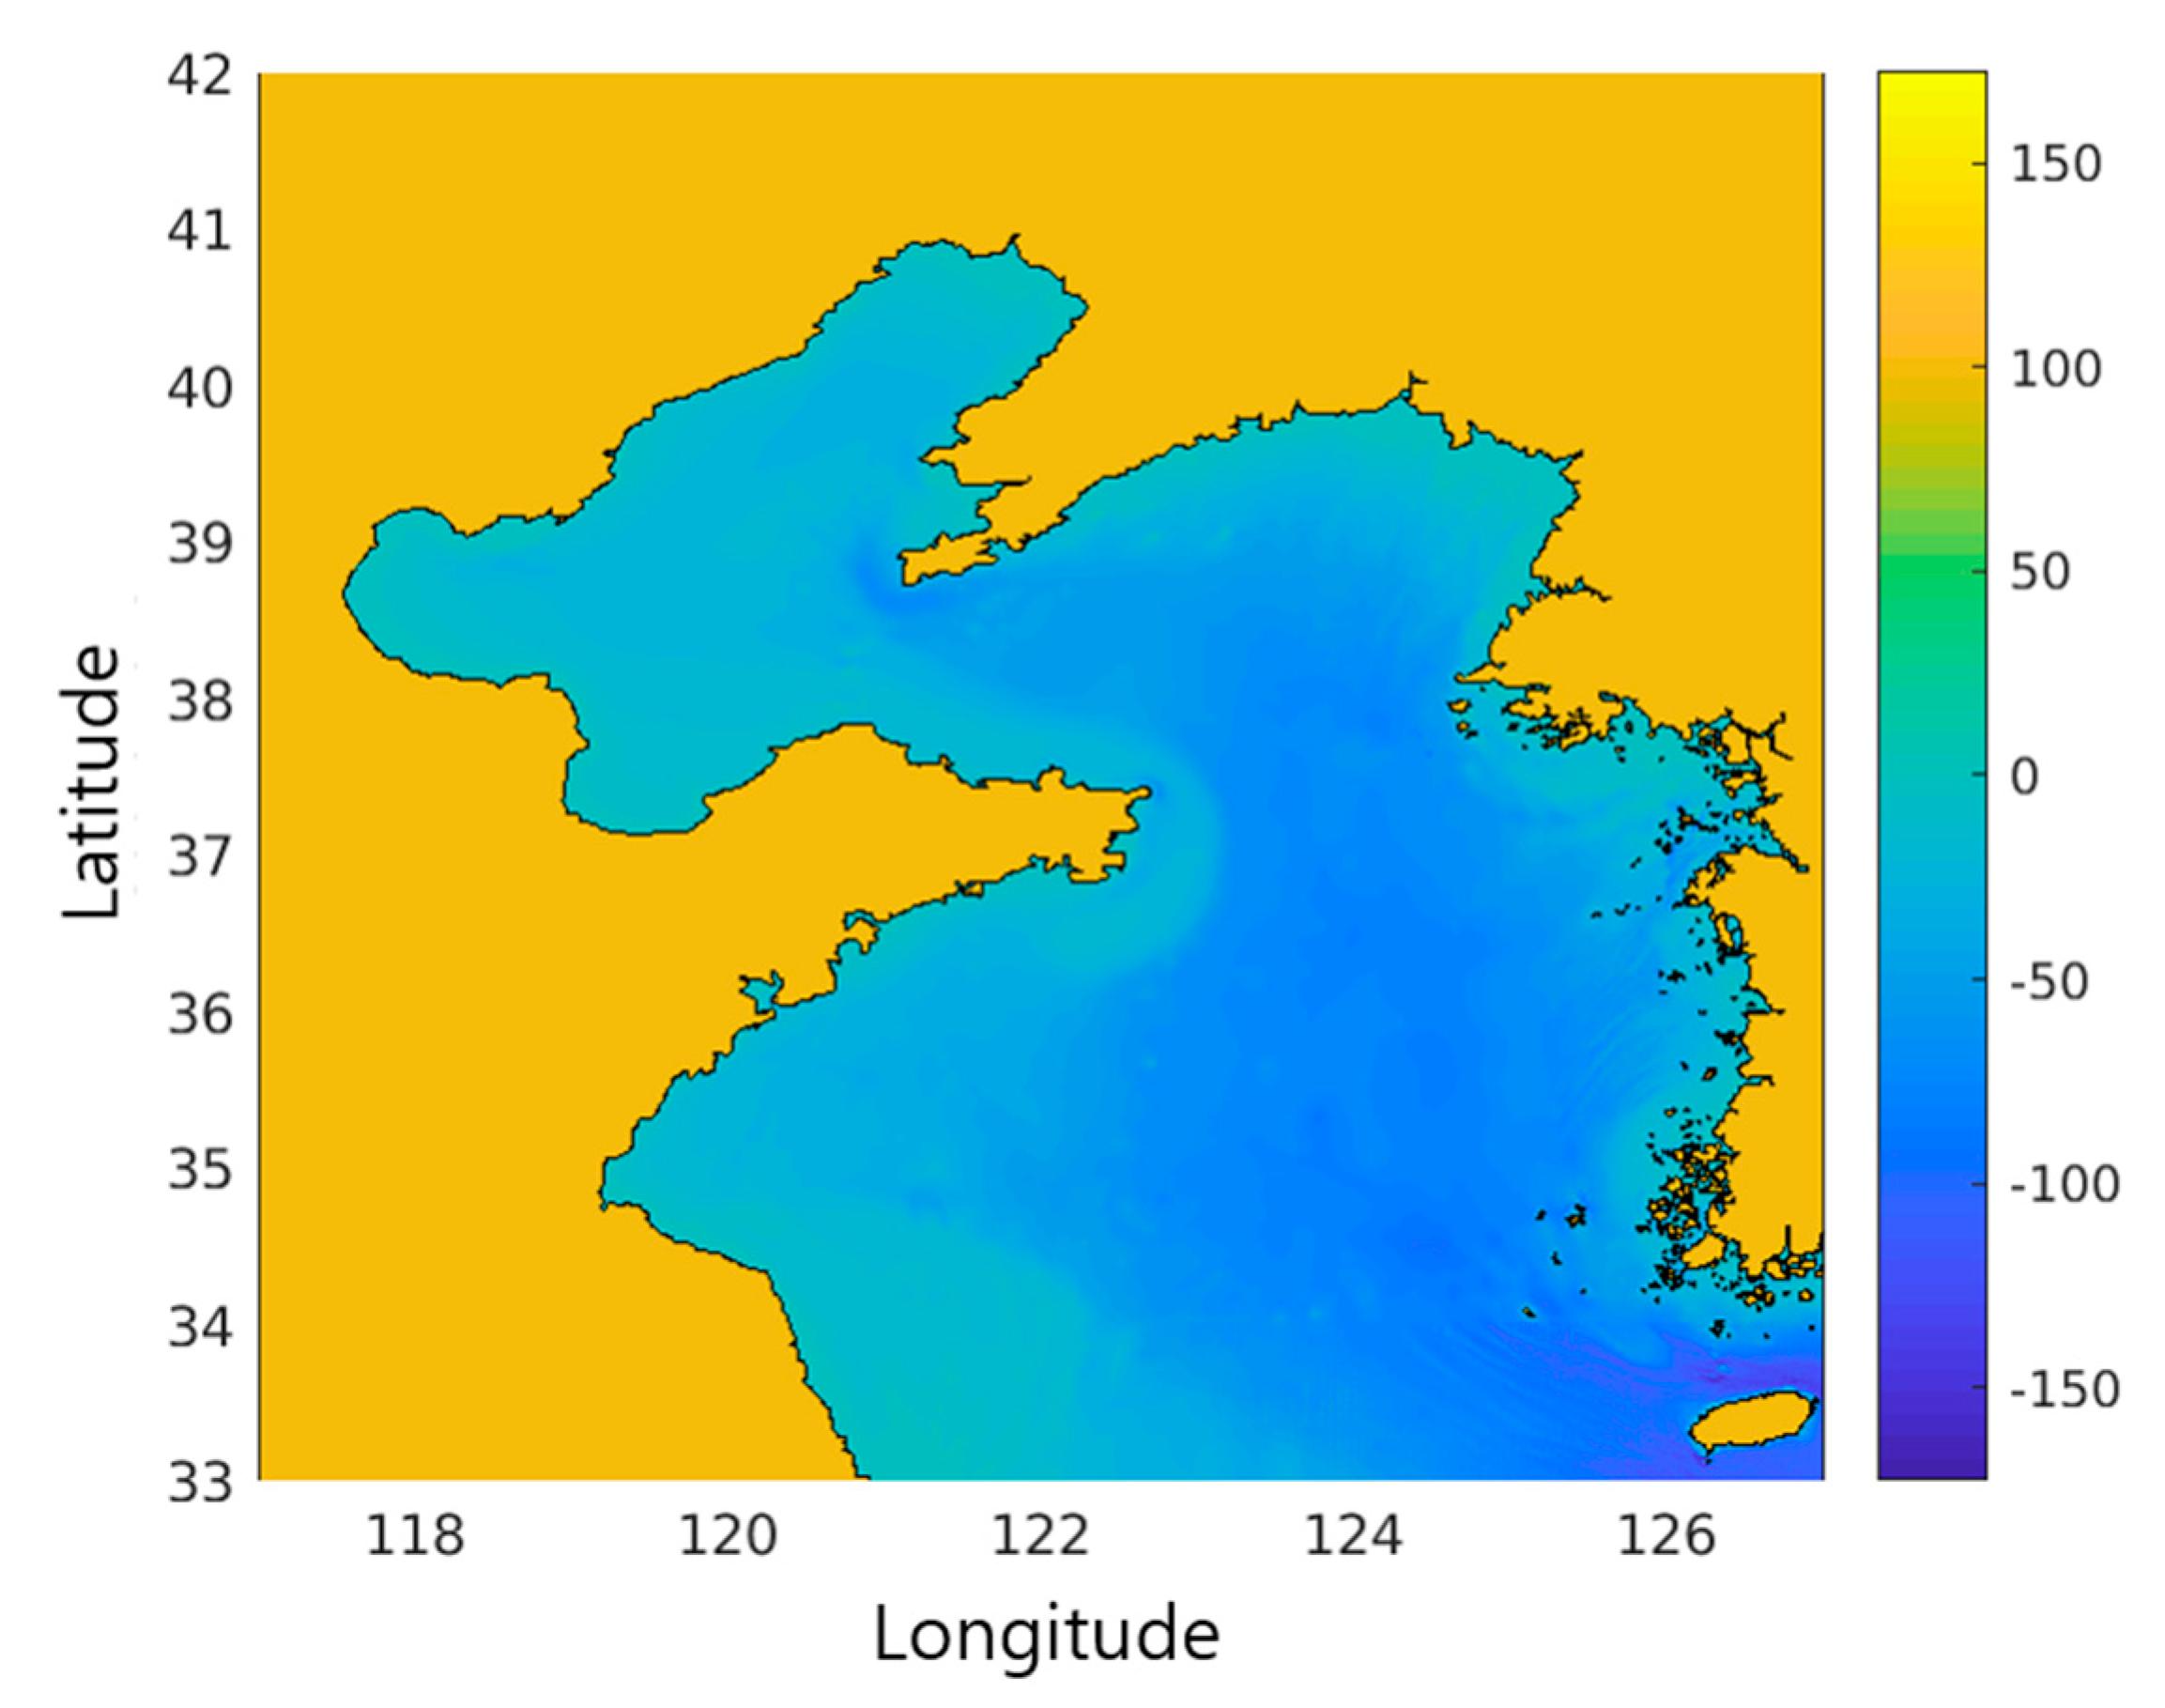 Yellow Sea Map on gulf of thailand map, baltic sea, white sea, pacific ocean map, gulf of guinea map, east china sea, yalu river map, beijing map, korean peninsula, mediterranean sea, bay of bengal map, barents sea, huang he map, adriatic sea, cape of good hope map, mekong map, coral sea, aegean sea, yellow river, indian ocean map, dead sea, north sea, suez canal map, south china sea, great dividing range map, sea of japan, persian gulf map, sea of okhotsk, red sea, plateau of tibet map, nile river map, caspian sea, manchurian plain map, black sea, gobi desert map, chang jiang map, arabian sea,